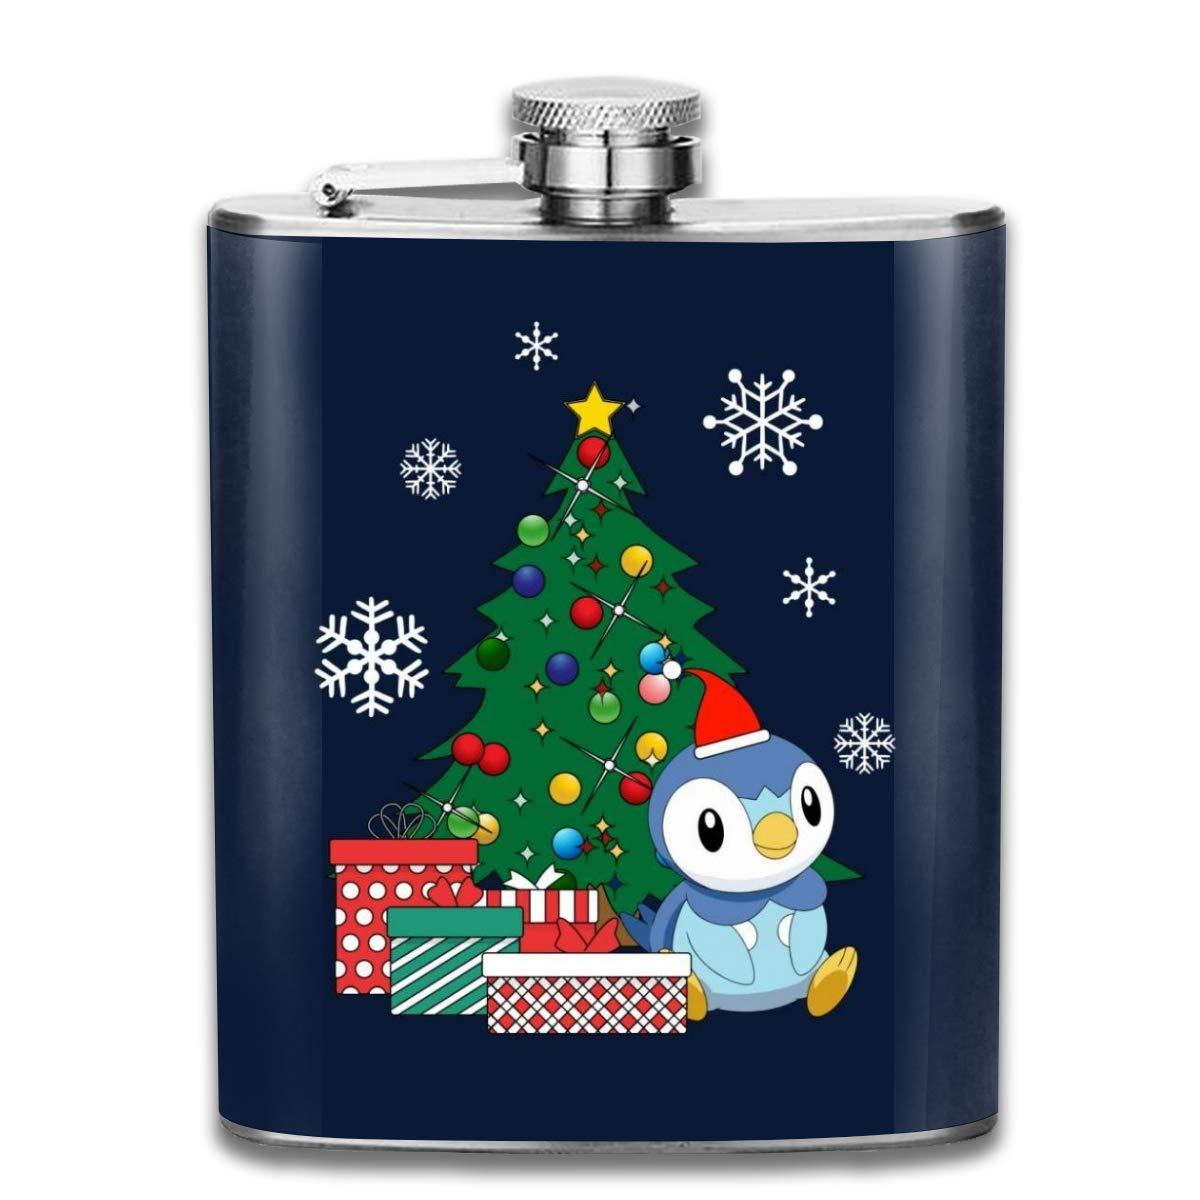 Piplup Flasque de poche en acier inoxydable Motif Around The Christmas Tree 200 ml